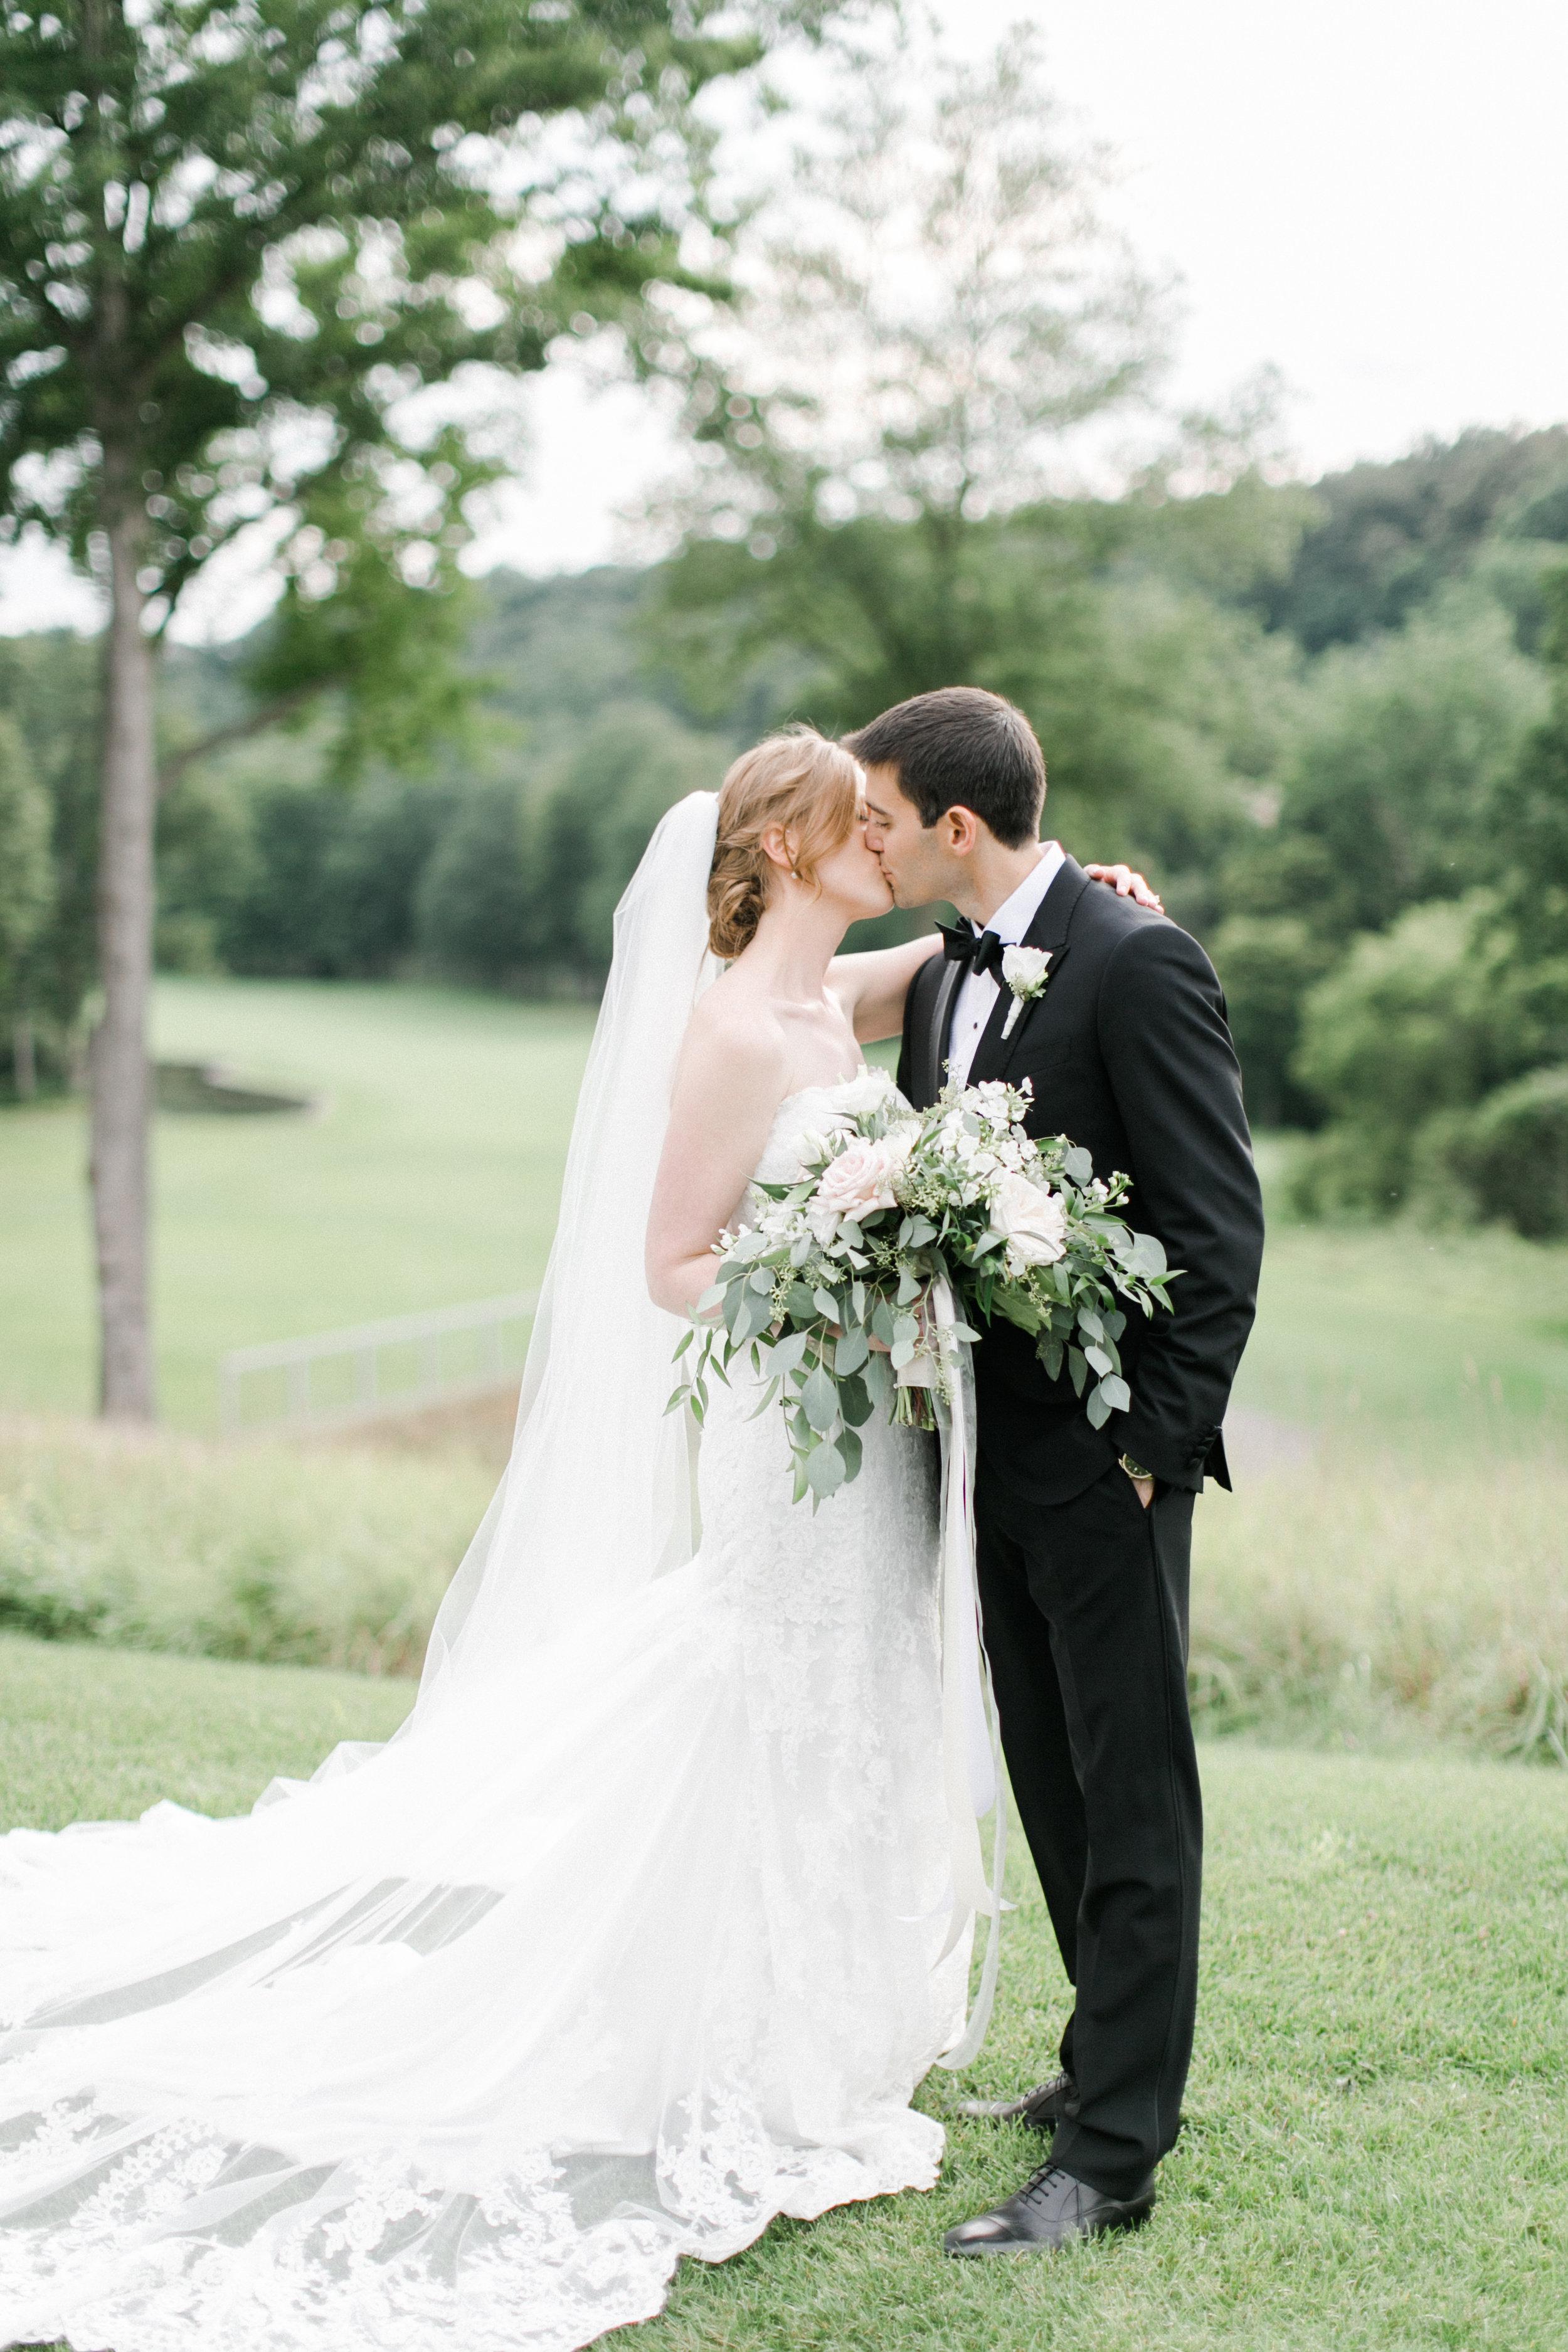 london-hunt-club-toronto-wedding-photographer-bright-richelle-hunter-jewish-ceremony-jessica-shemer-708.jpg